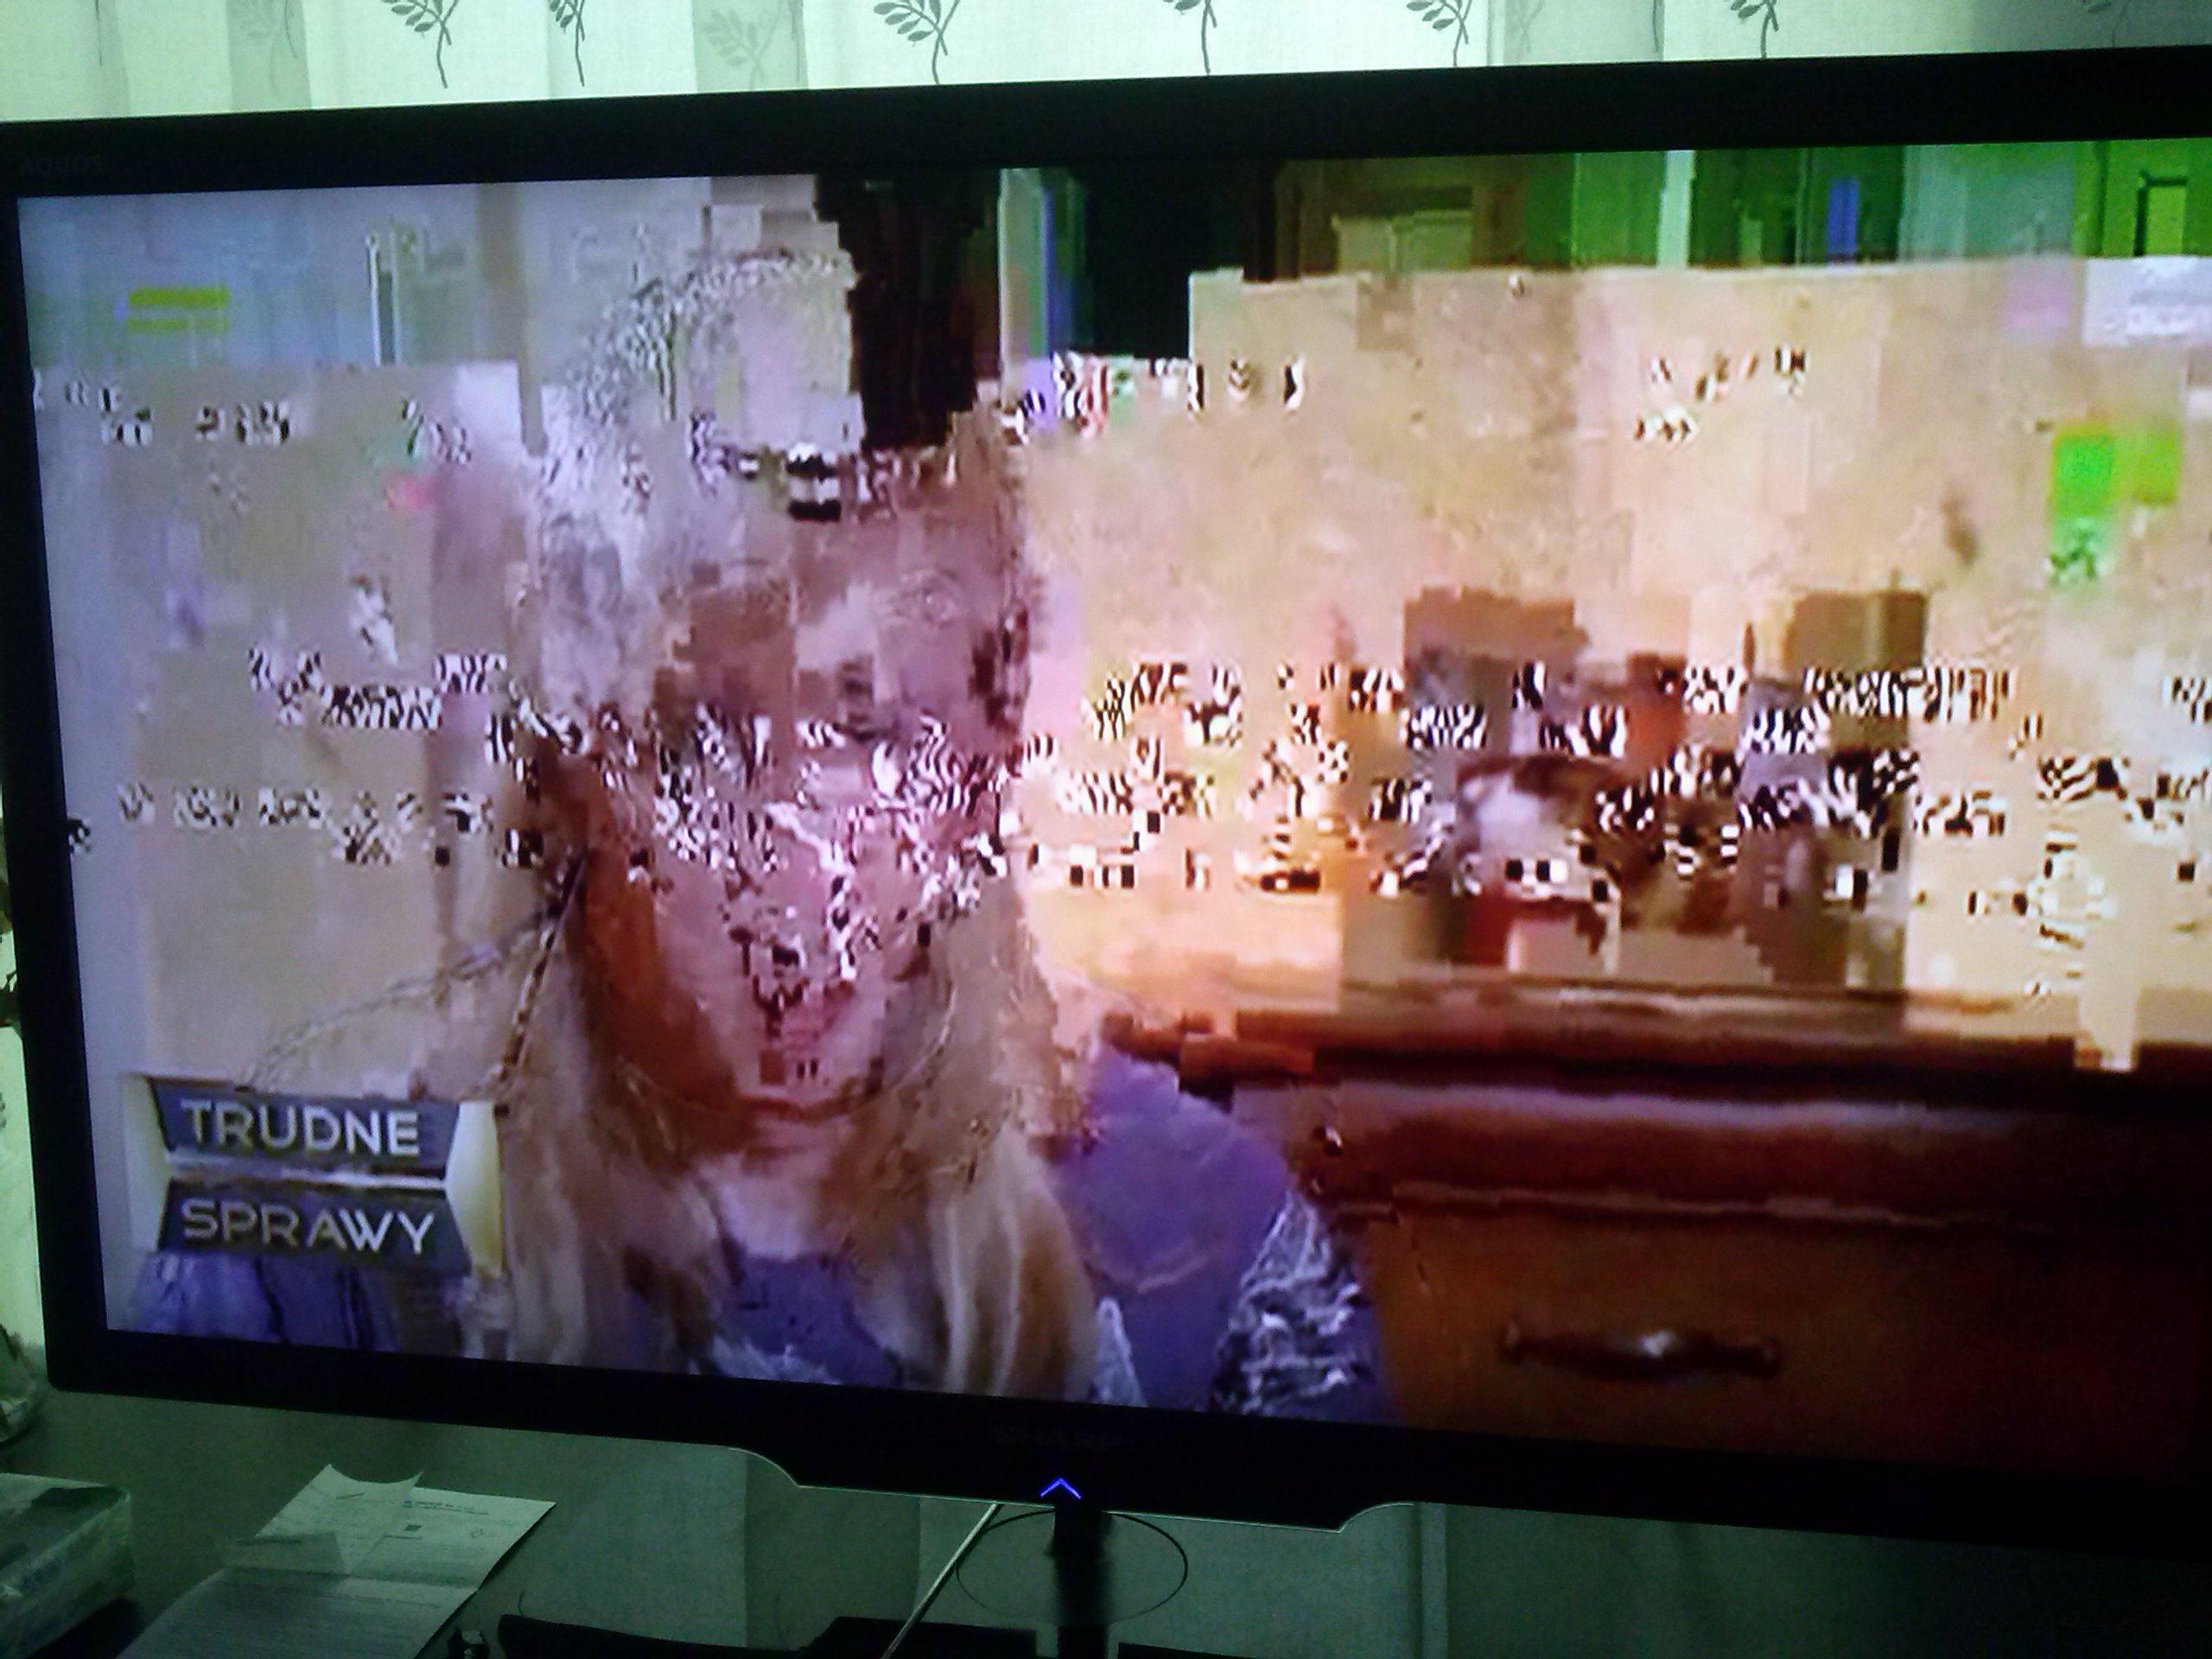 Kolorowe kwadraciki na ekranie tv